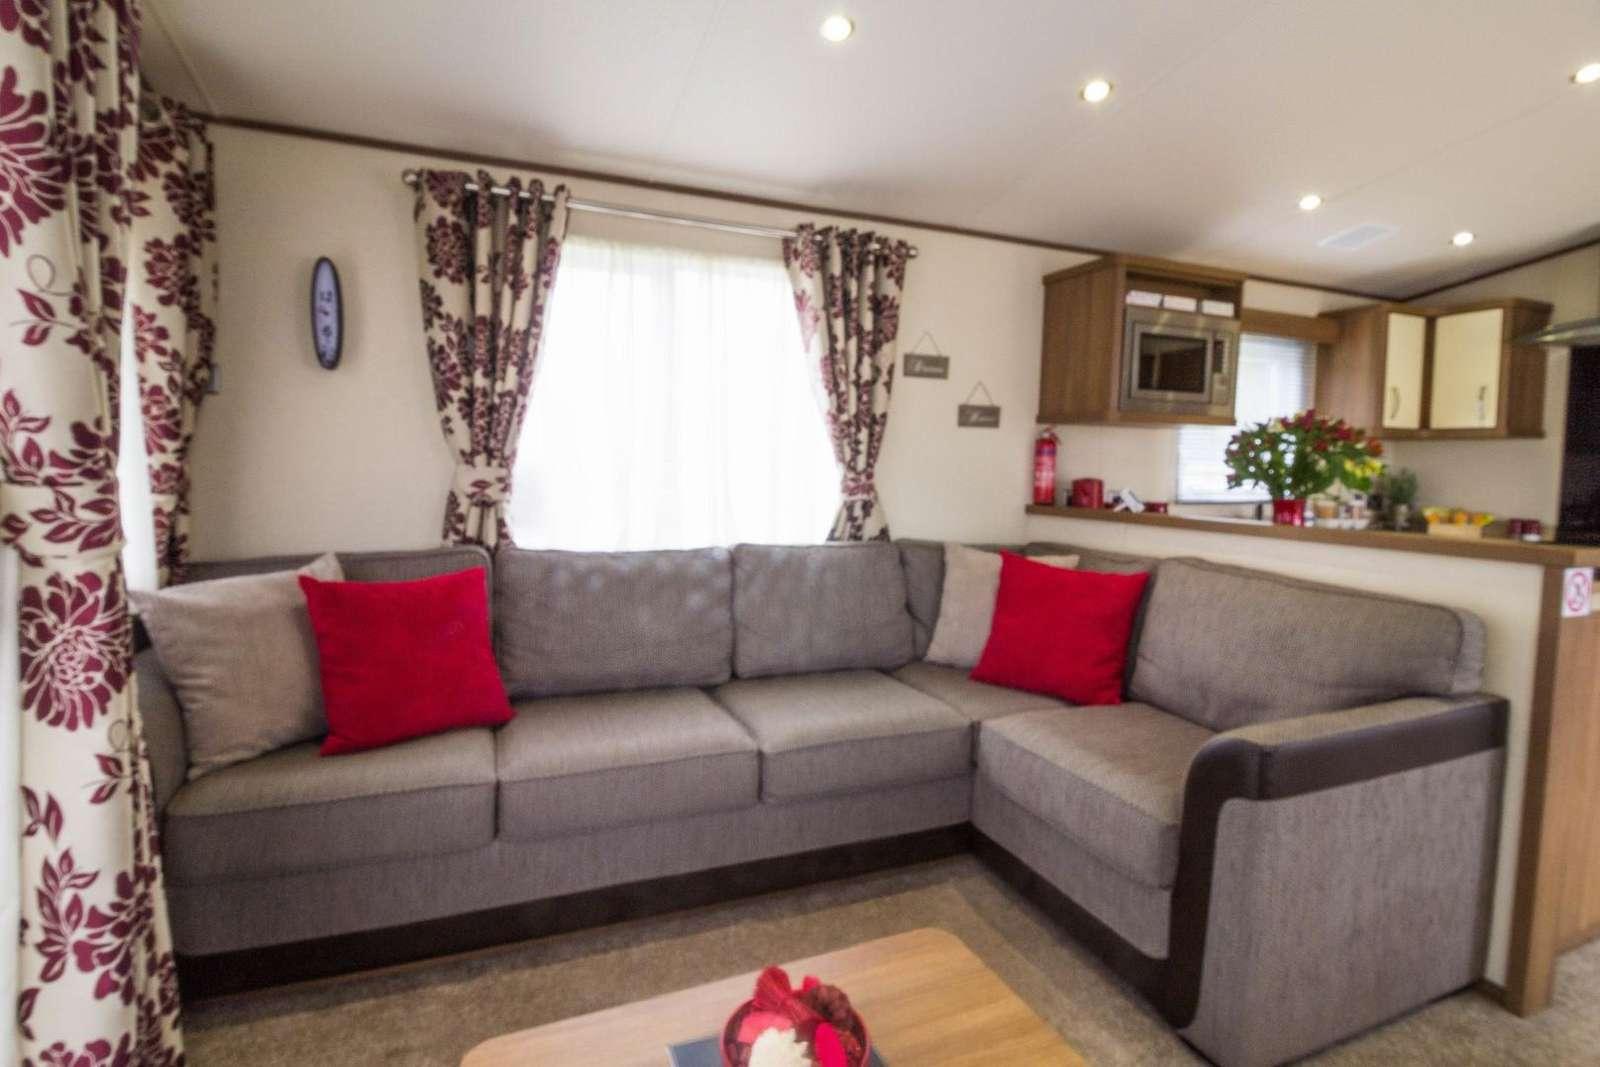 Luxury lounge with modern decor. Near BeWILDerwood only 12.5 miles away.